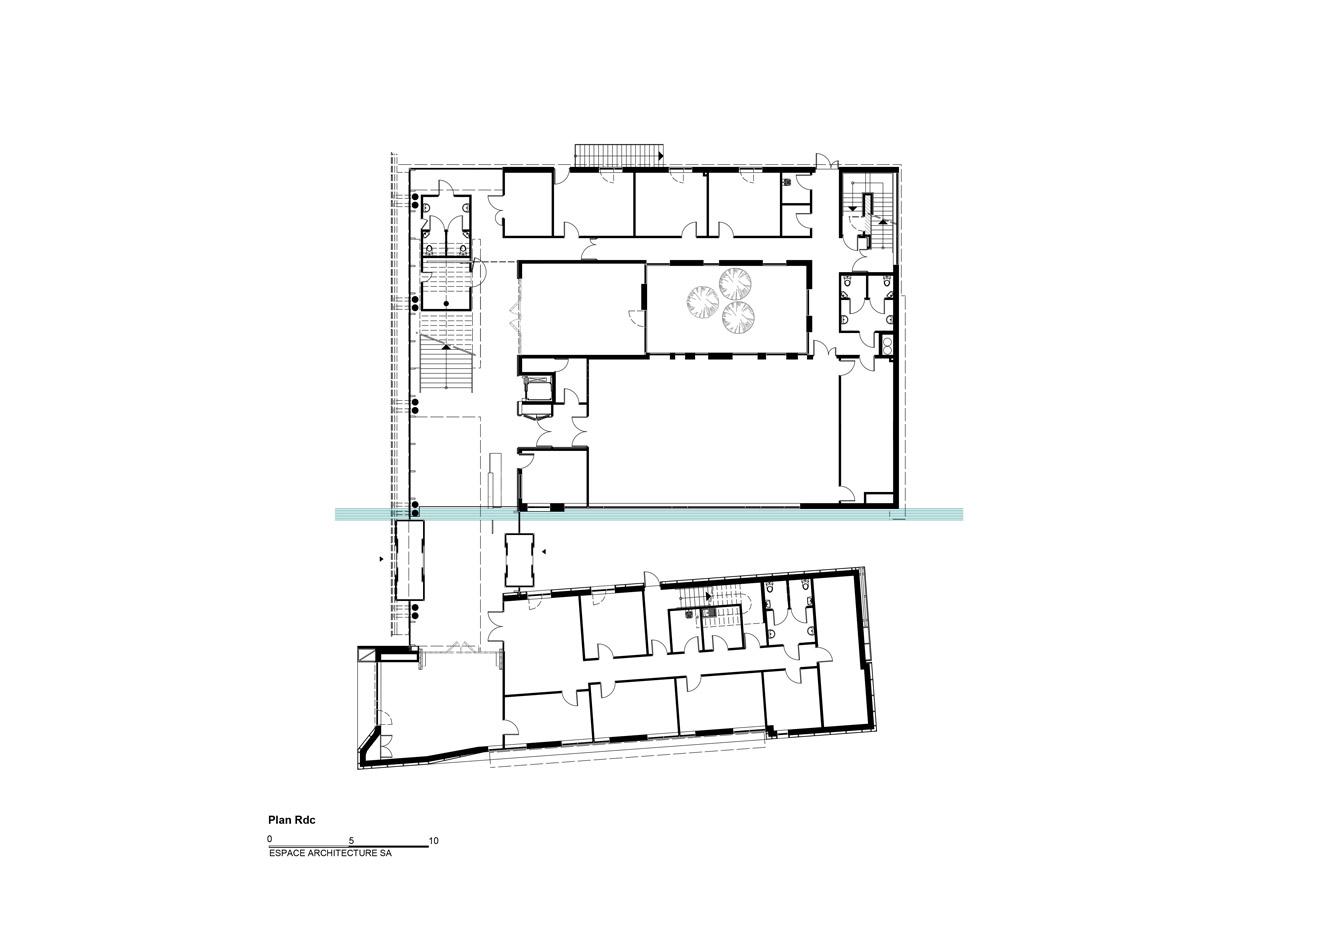 Hotel-de-ville-Freyming_Plan-RDC